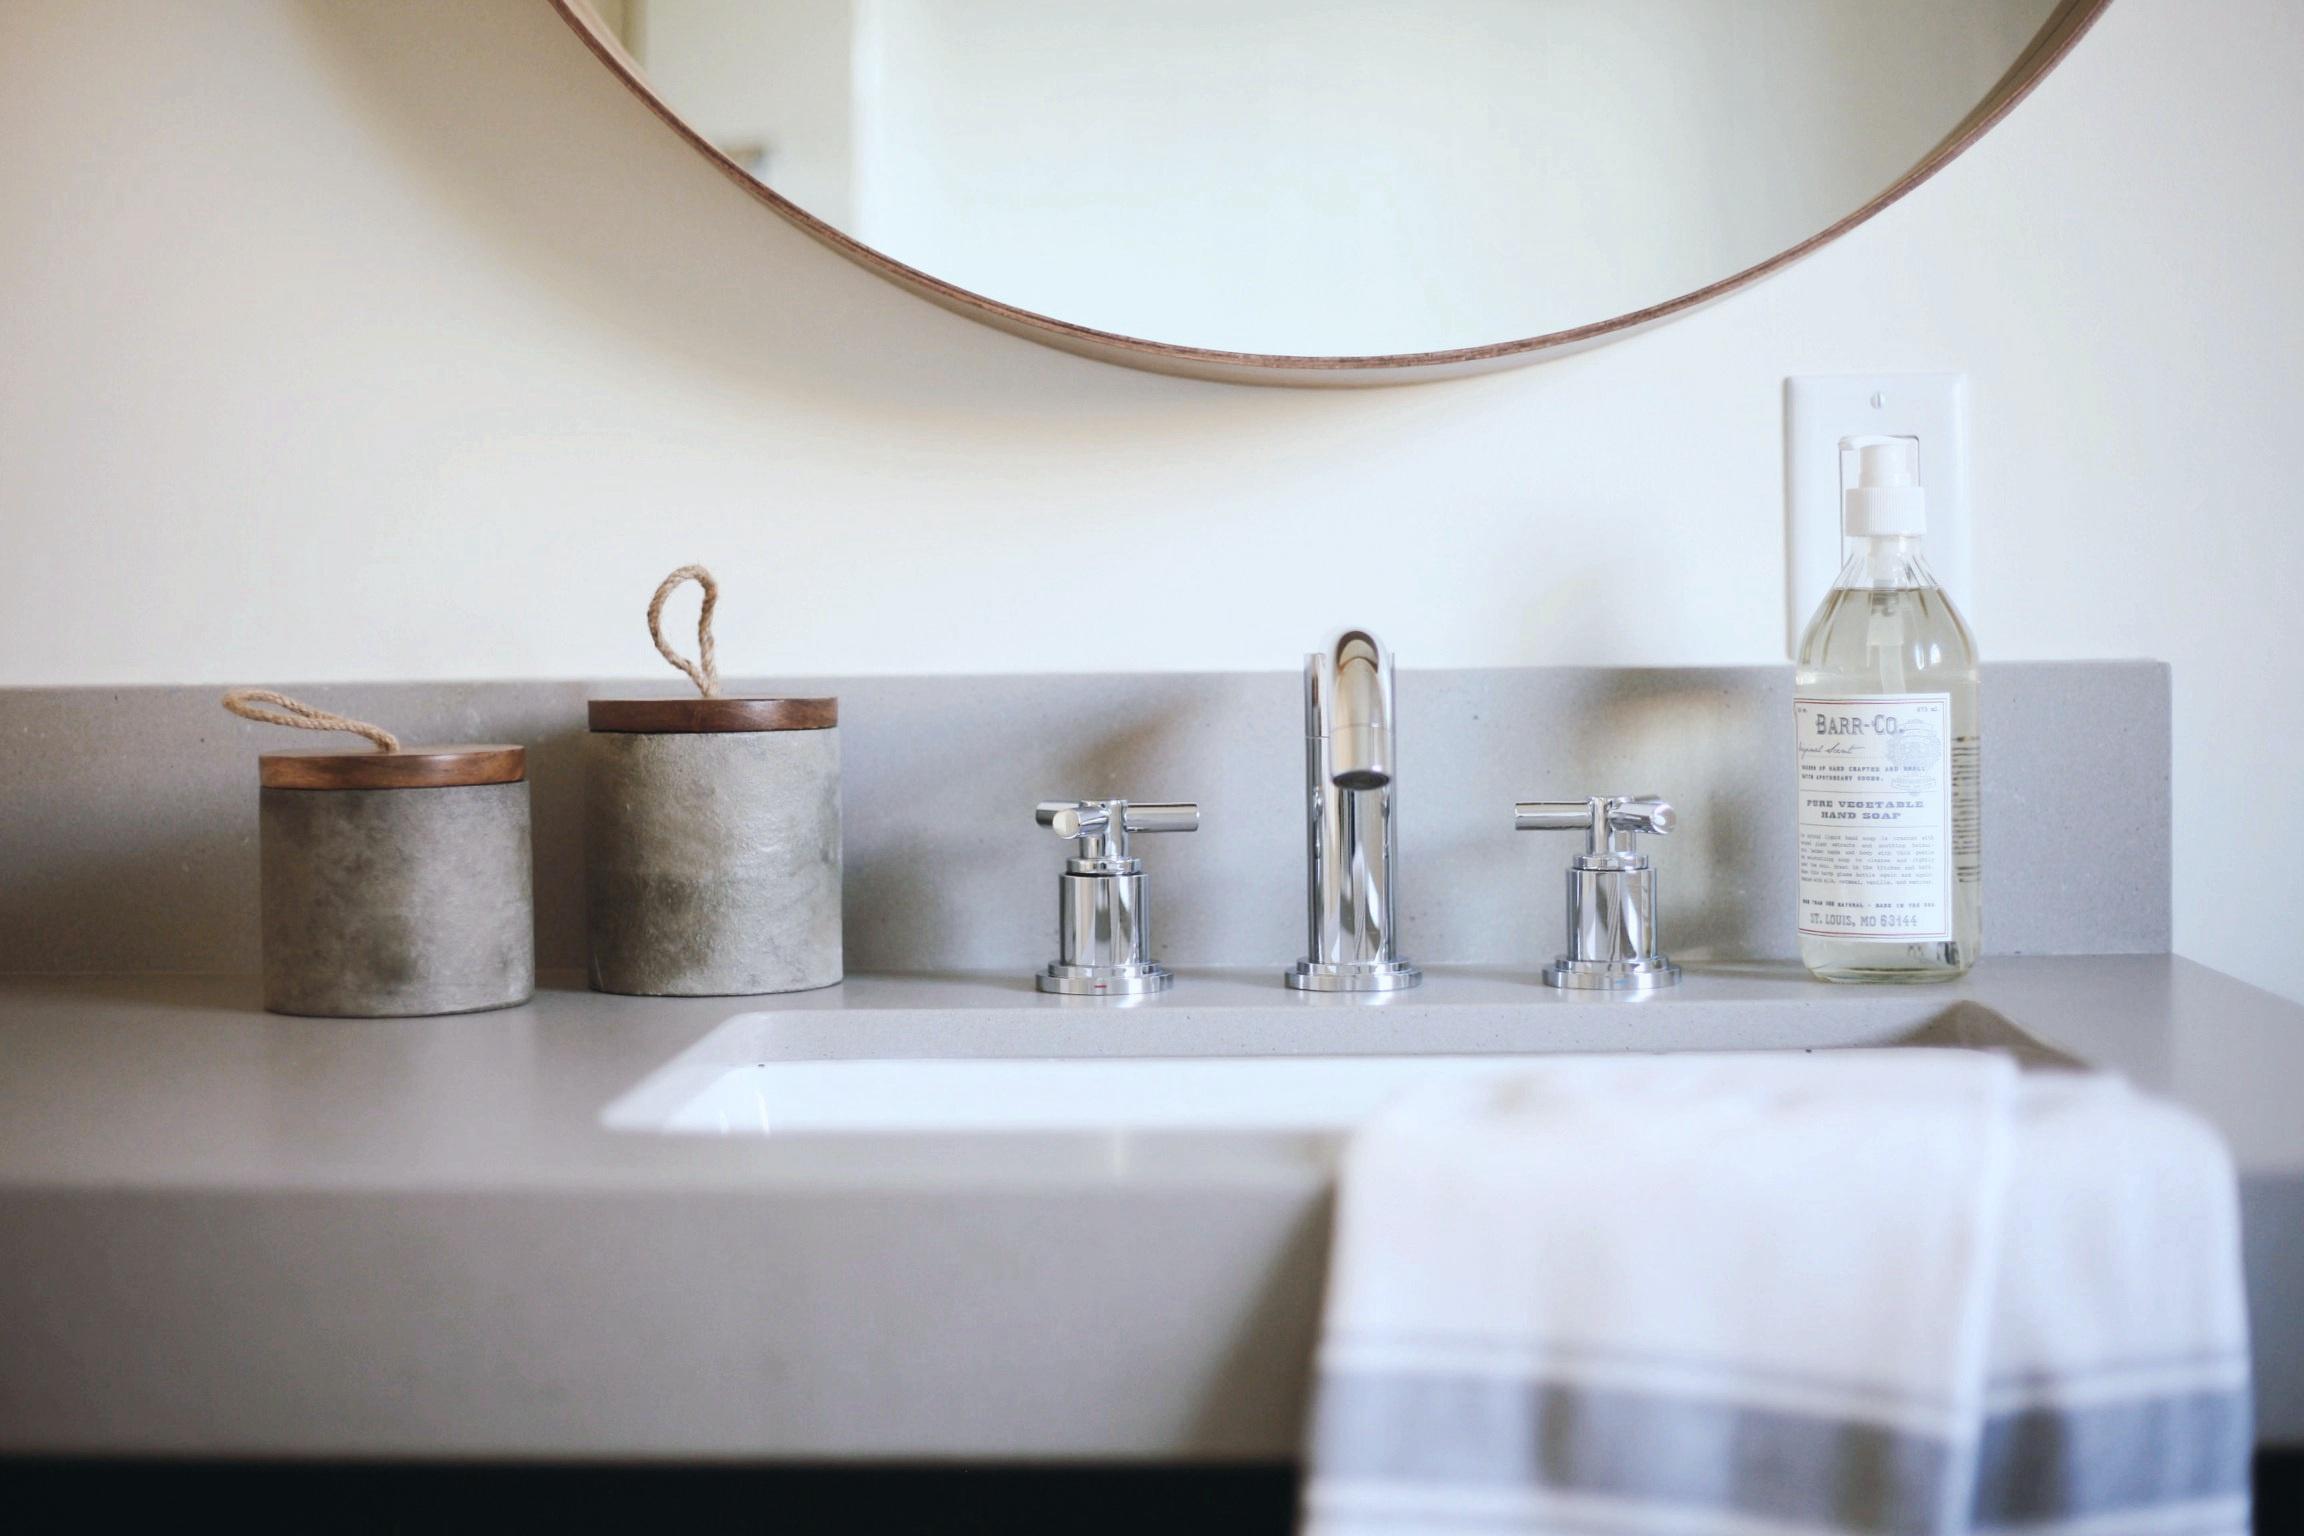 Bathroom sink Details Country Club